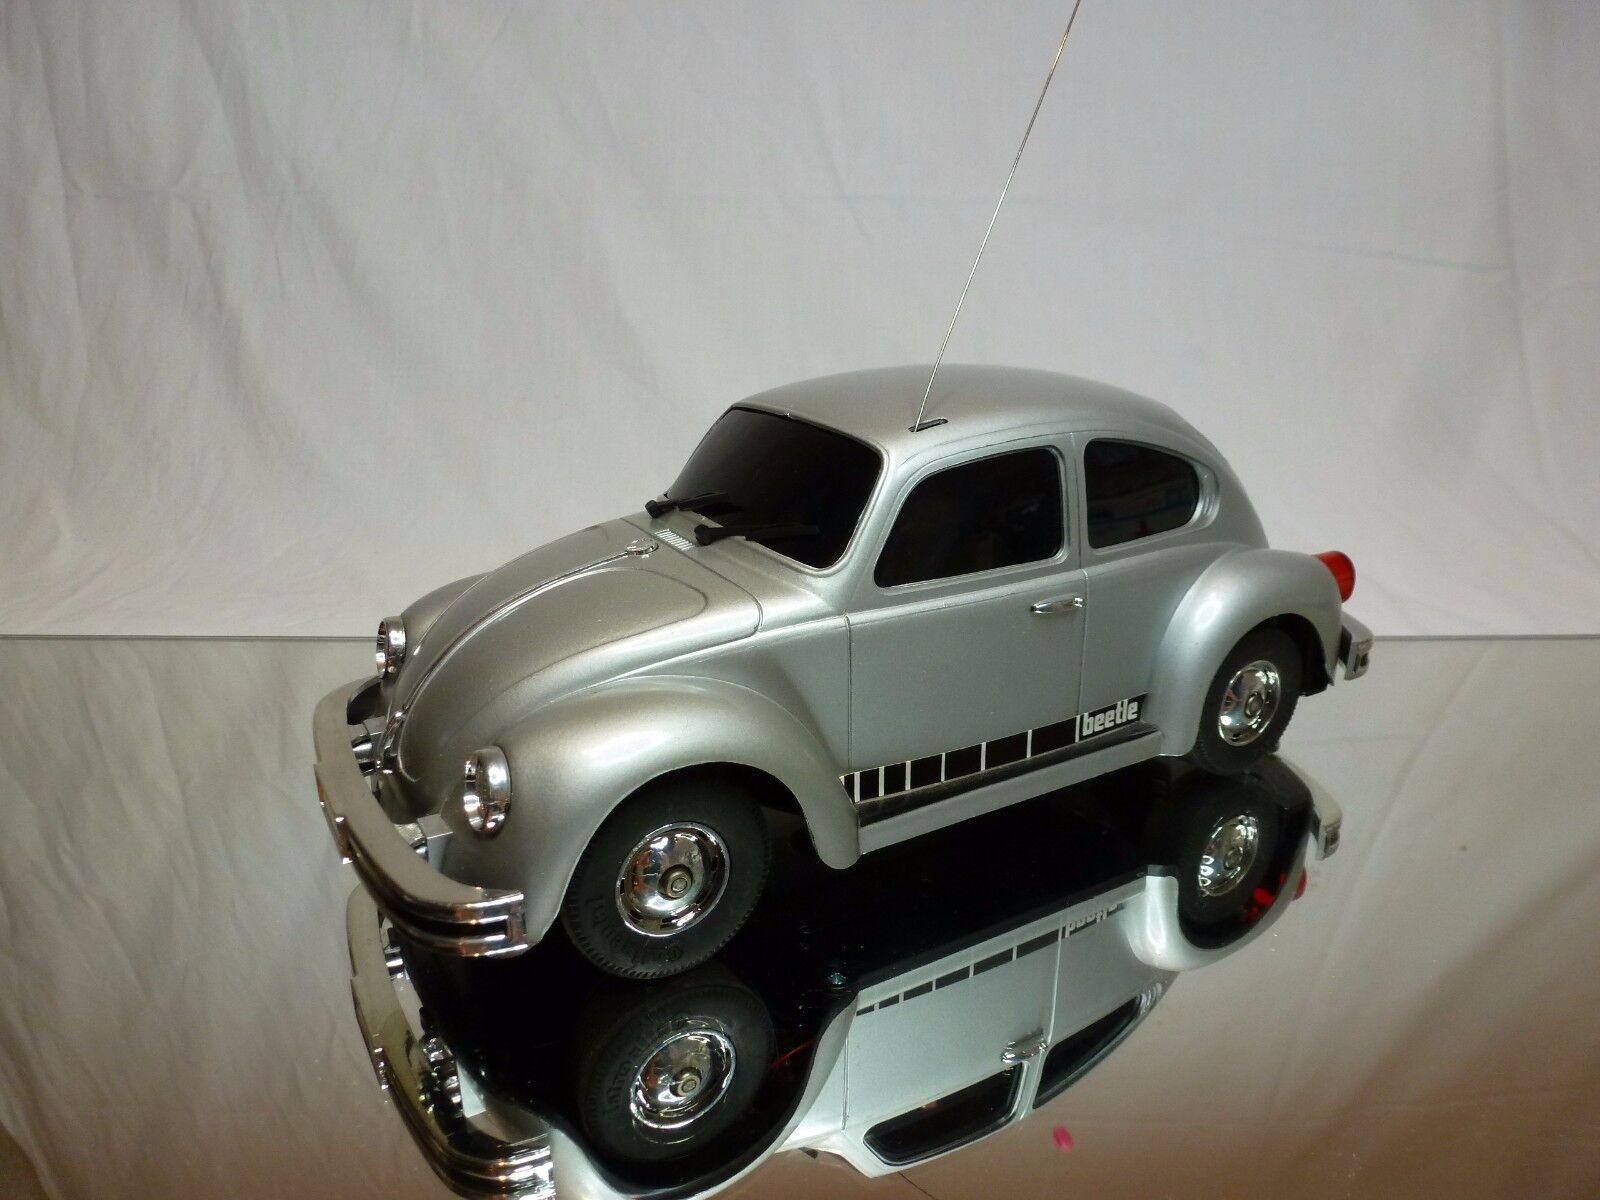 MT JAPAN VW VOLKSWAGEN BEETLE - RC RADIO CONTROL - plata L26.0cm - GOOD COND